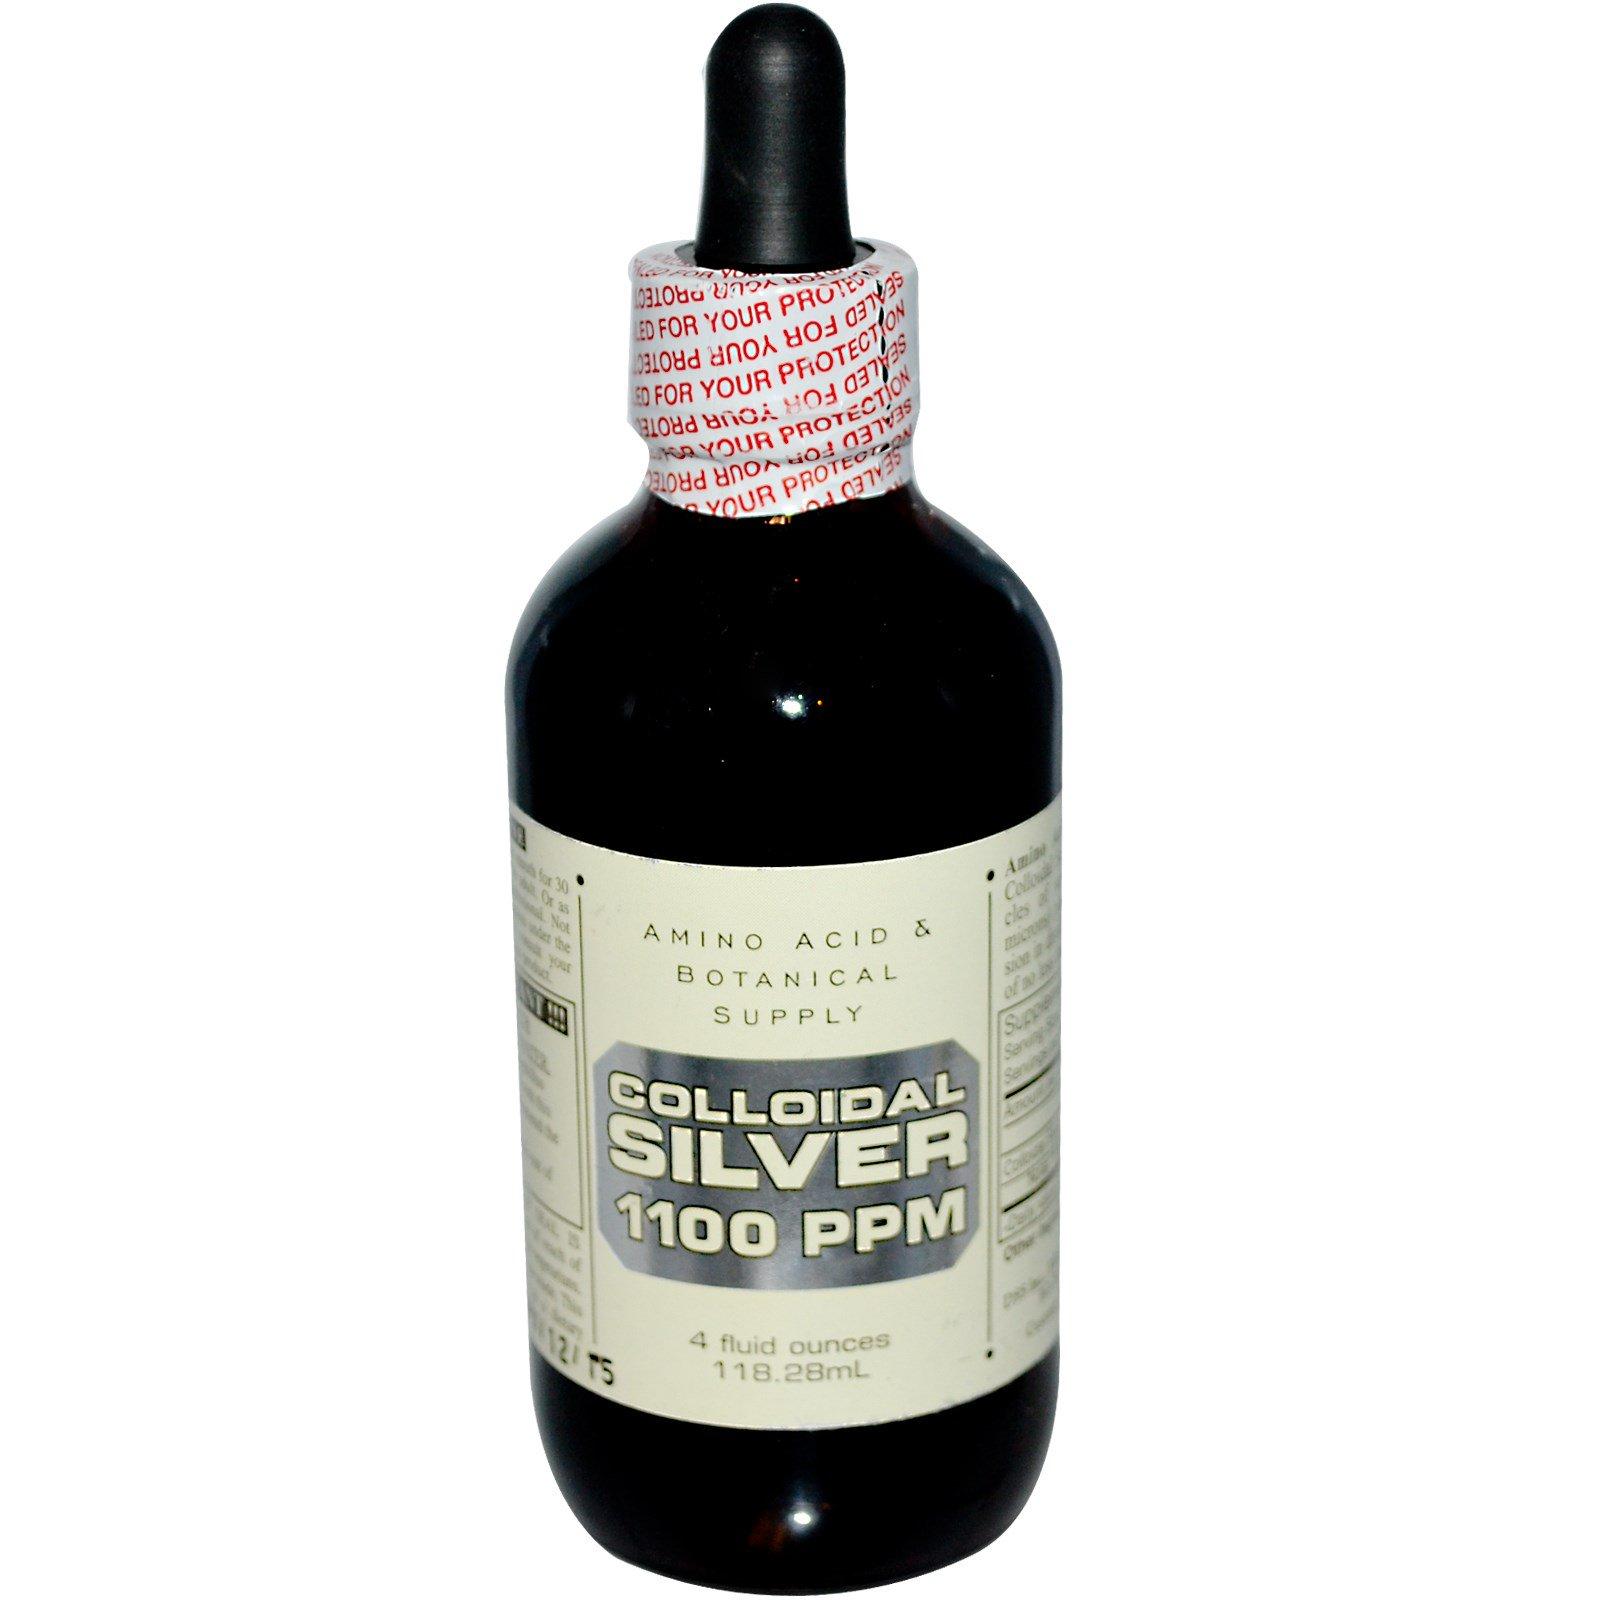 Amino Acid & Botanical Supply, Коллоидное серебро, 1100 частей на миллион, 4 жидких унции (118,28 мл)